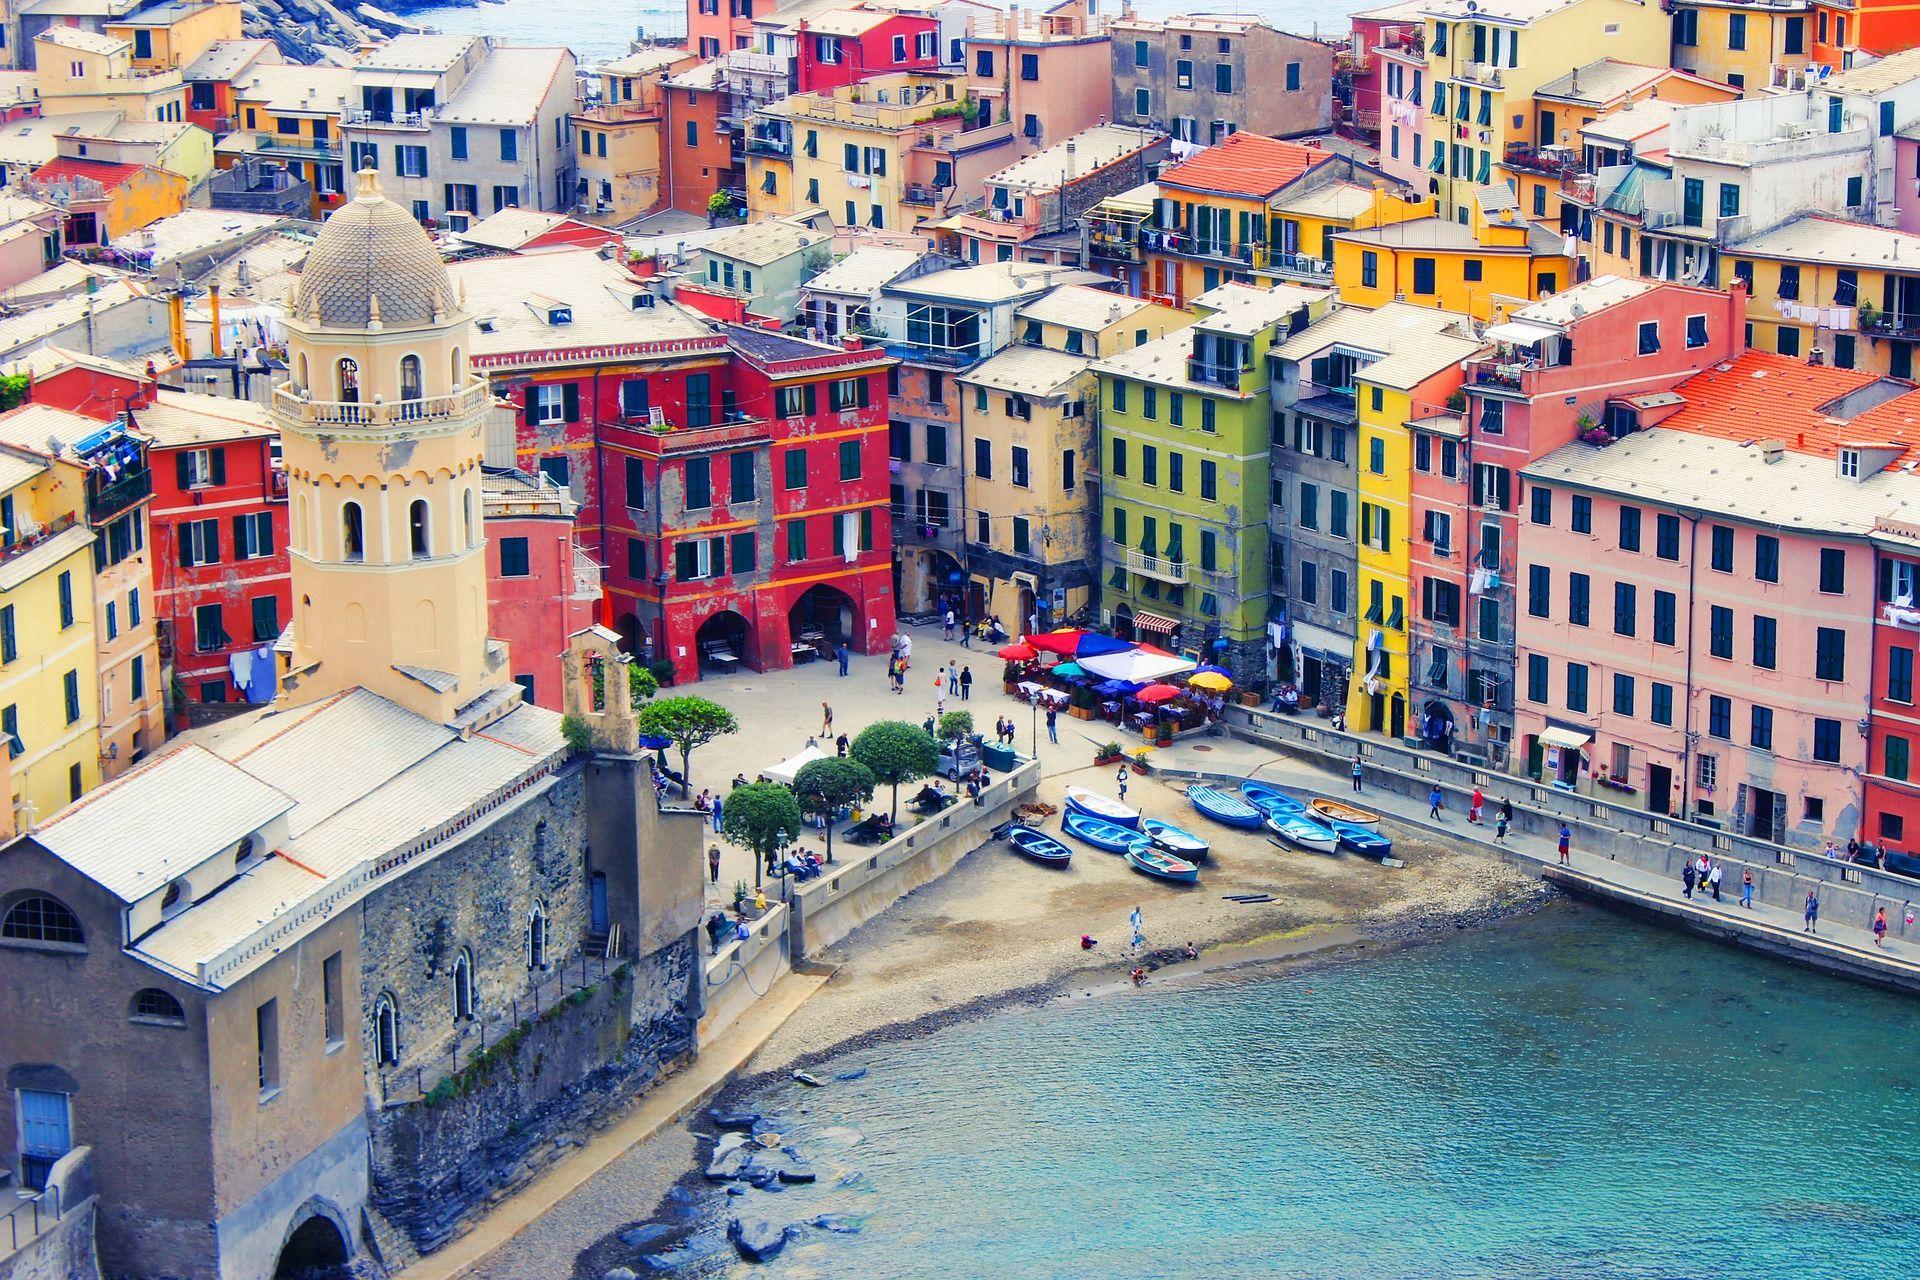 Unexpected romantic getaway Cinque Terre - Italy